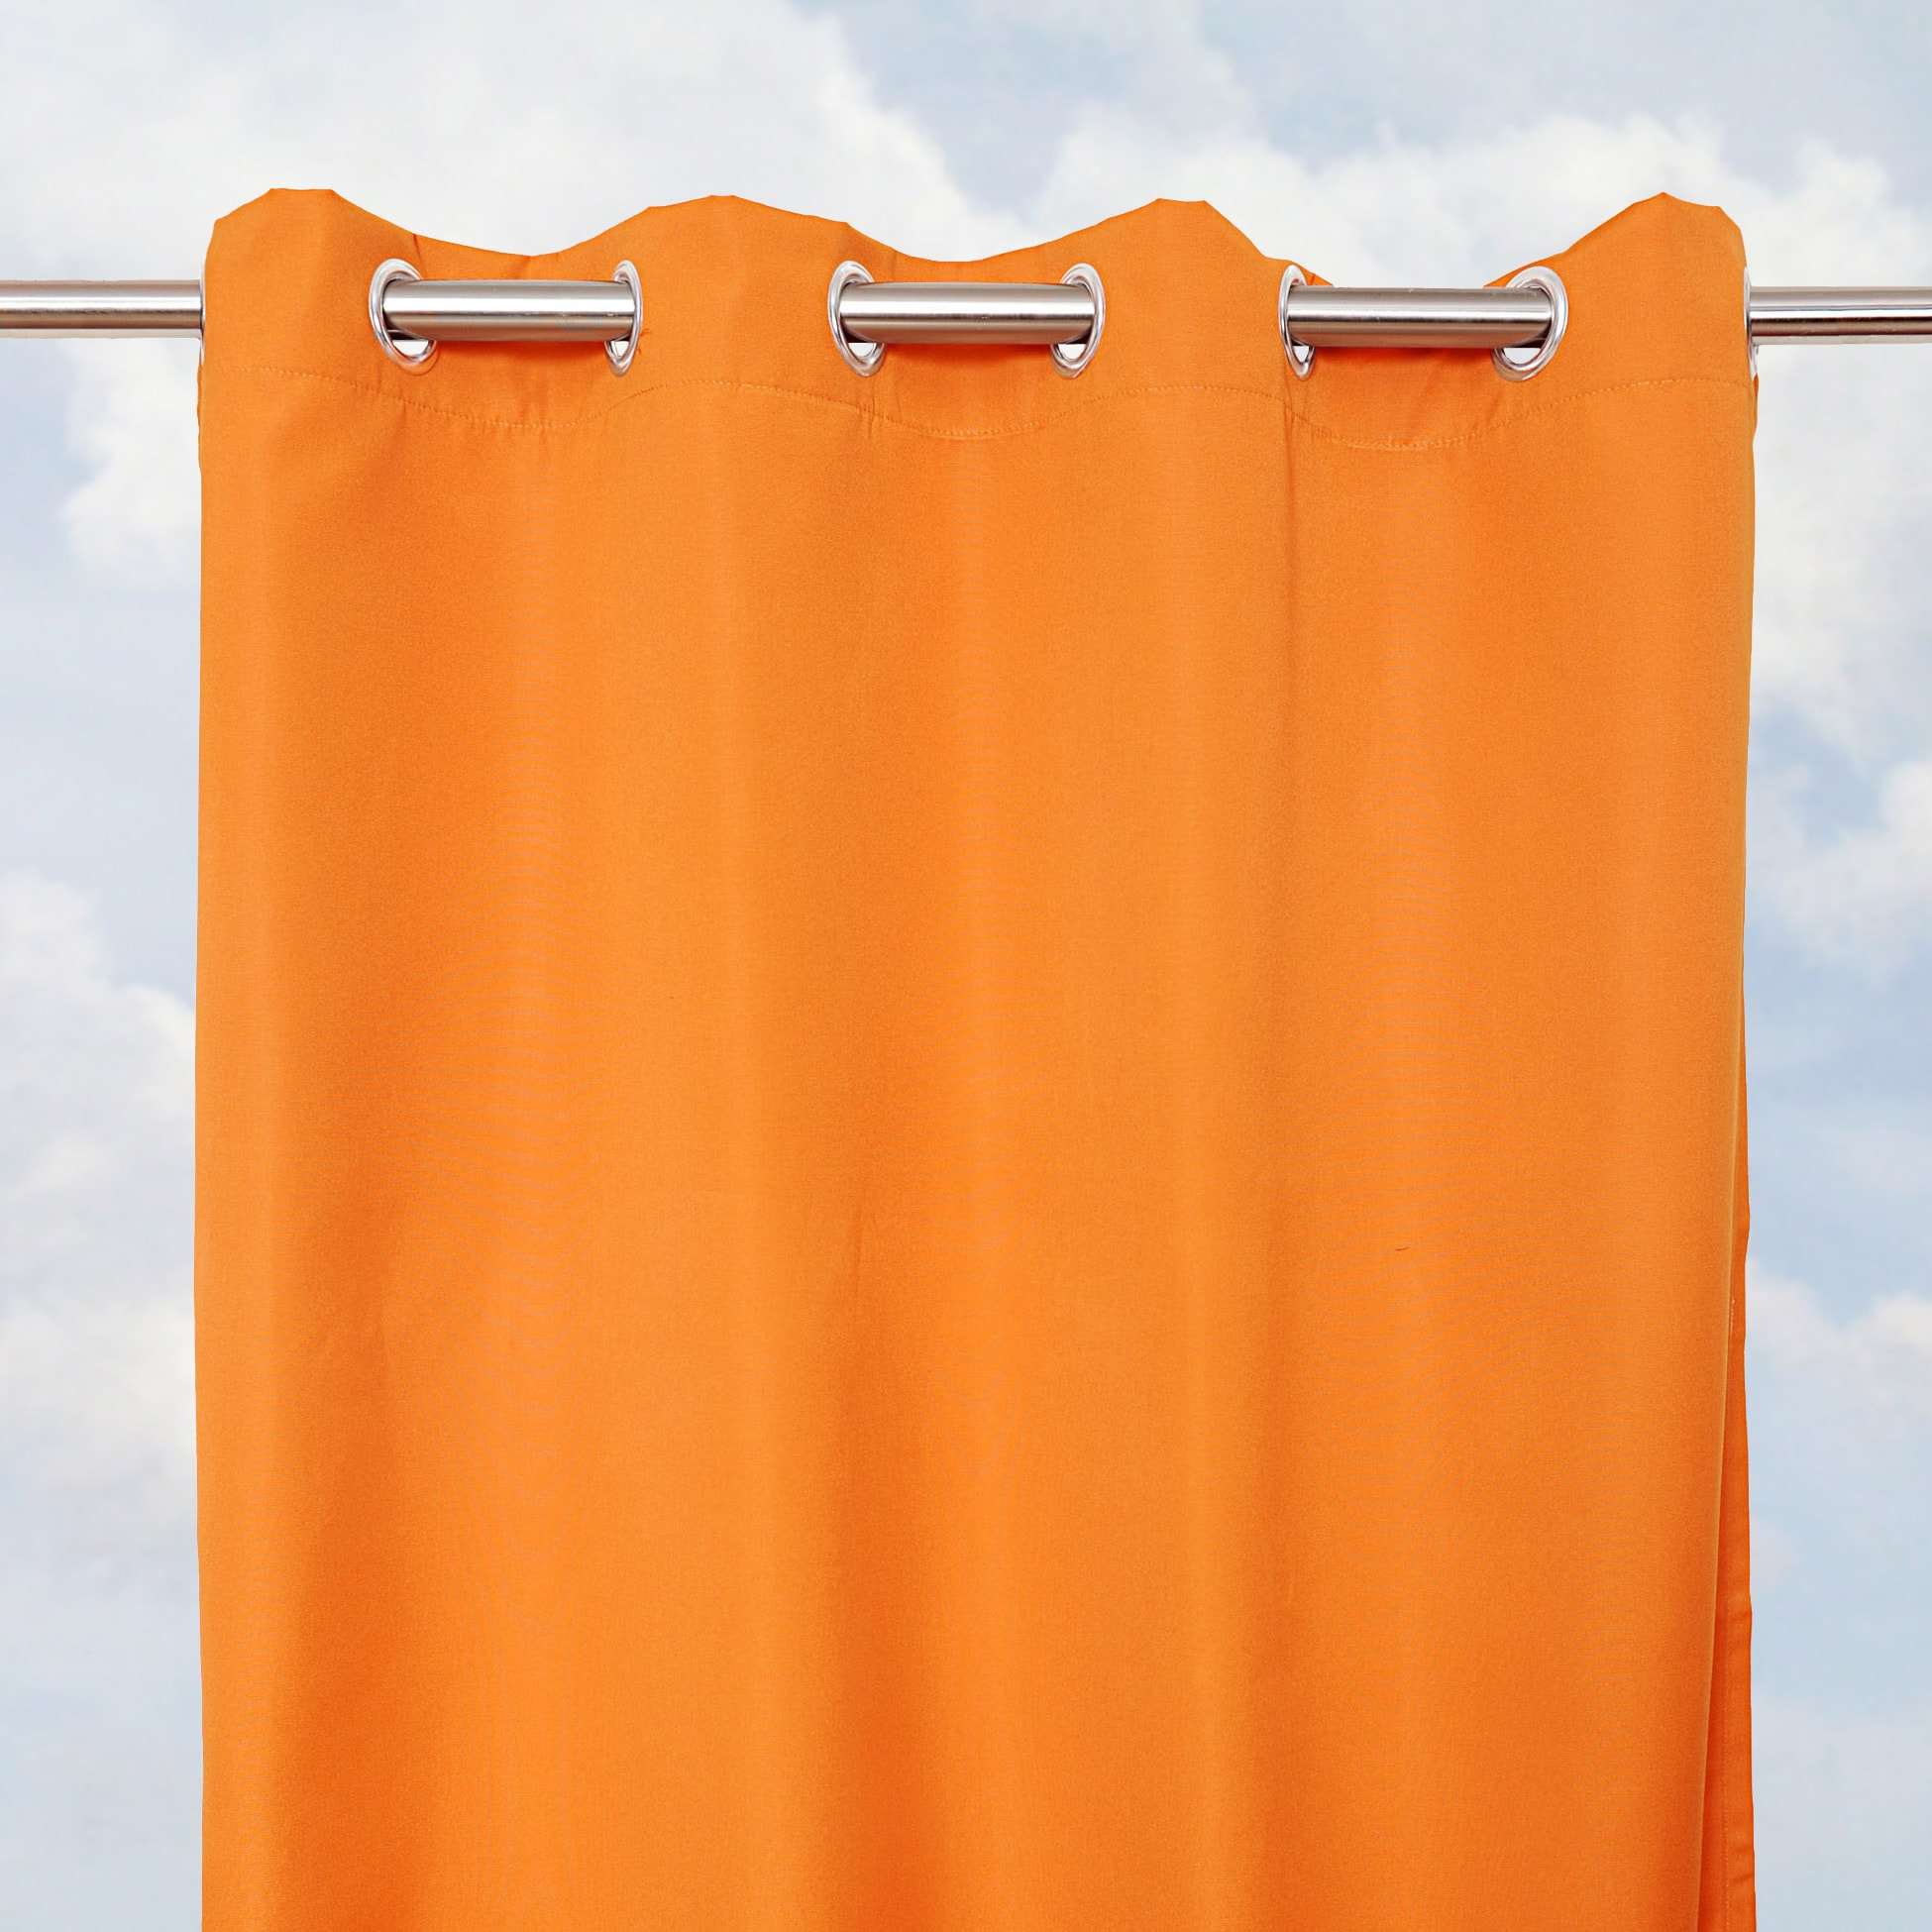 Sunbrella Bay View Tuscan 96-inch Outdoor Curtain Panel